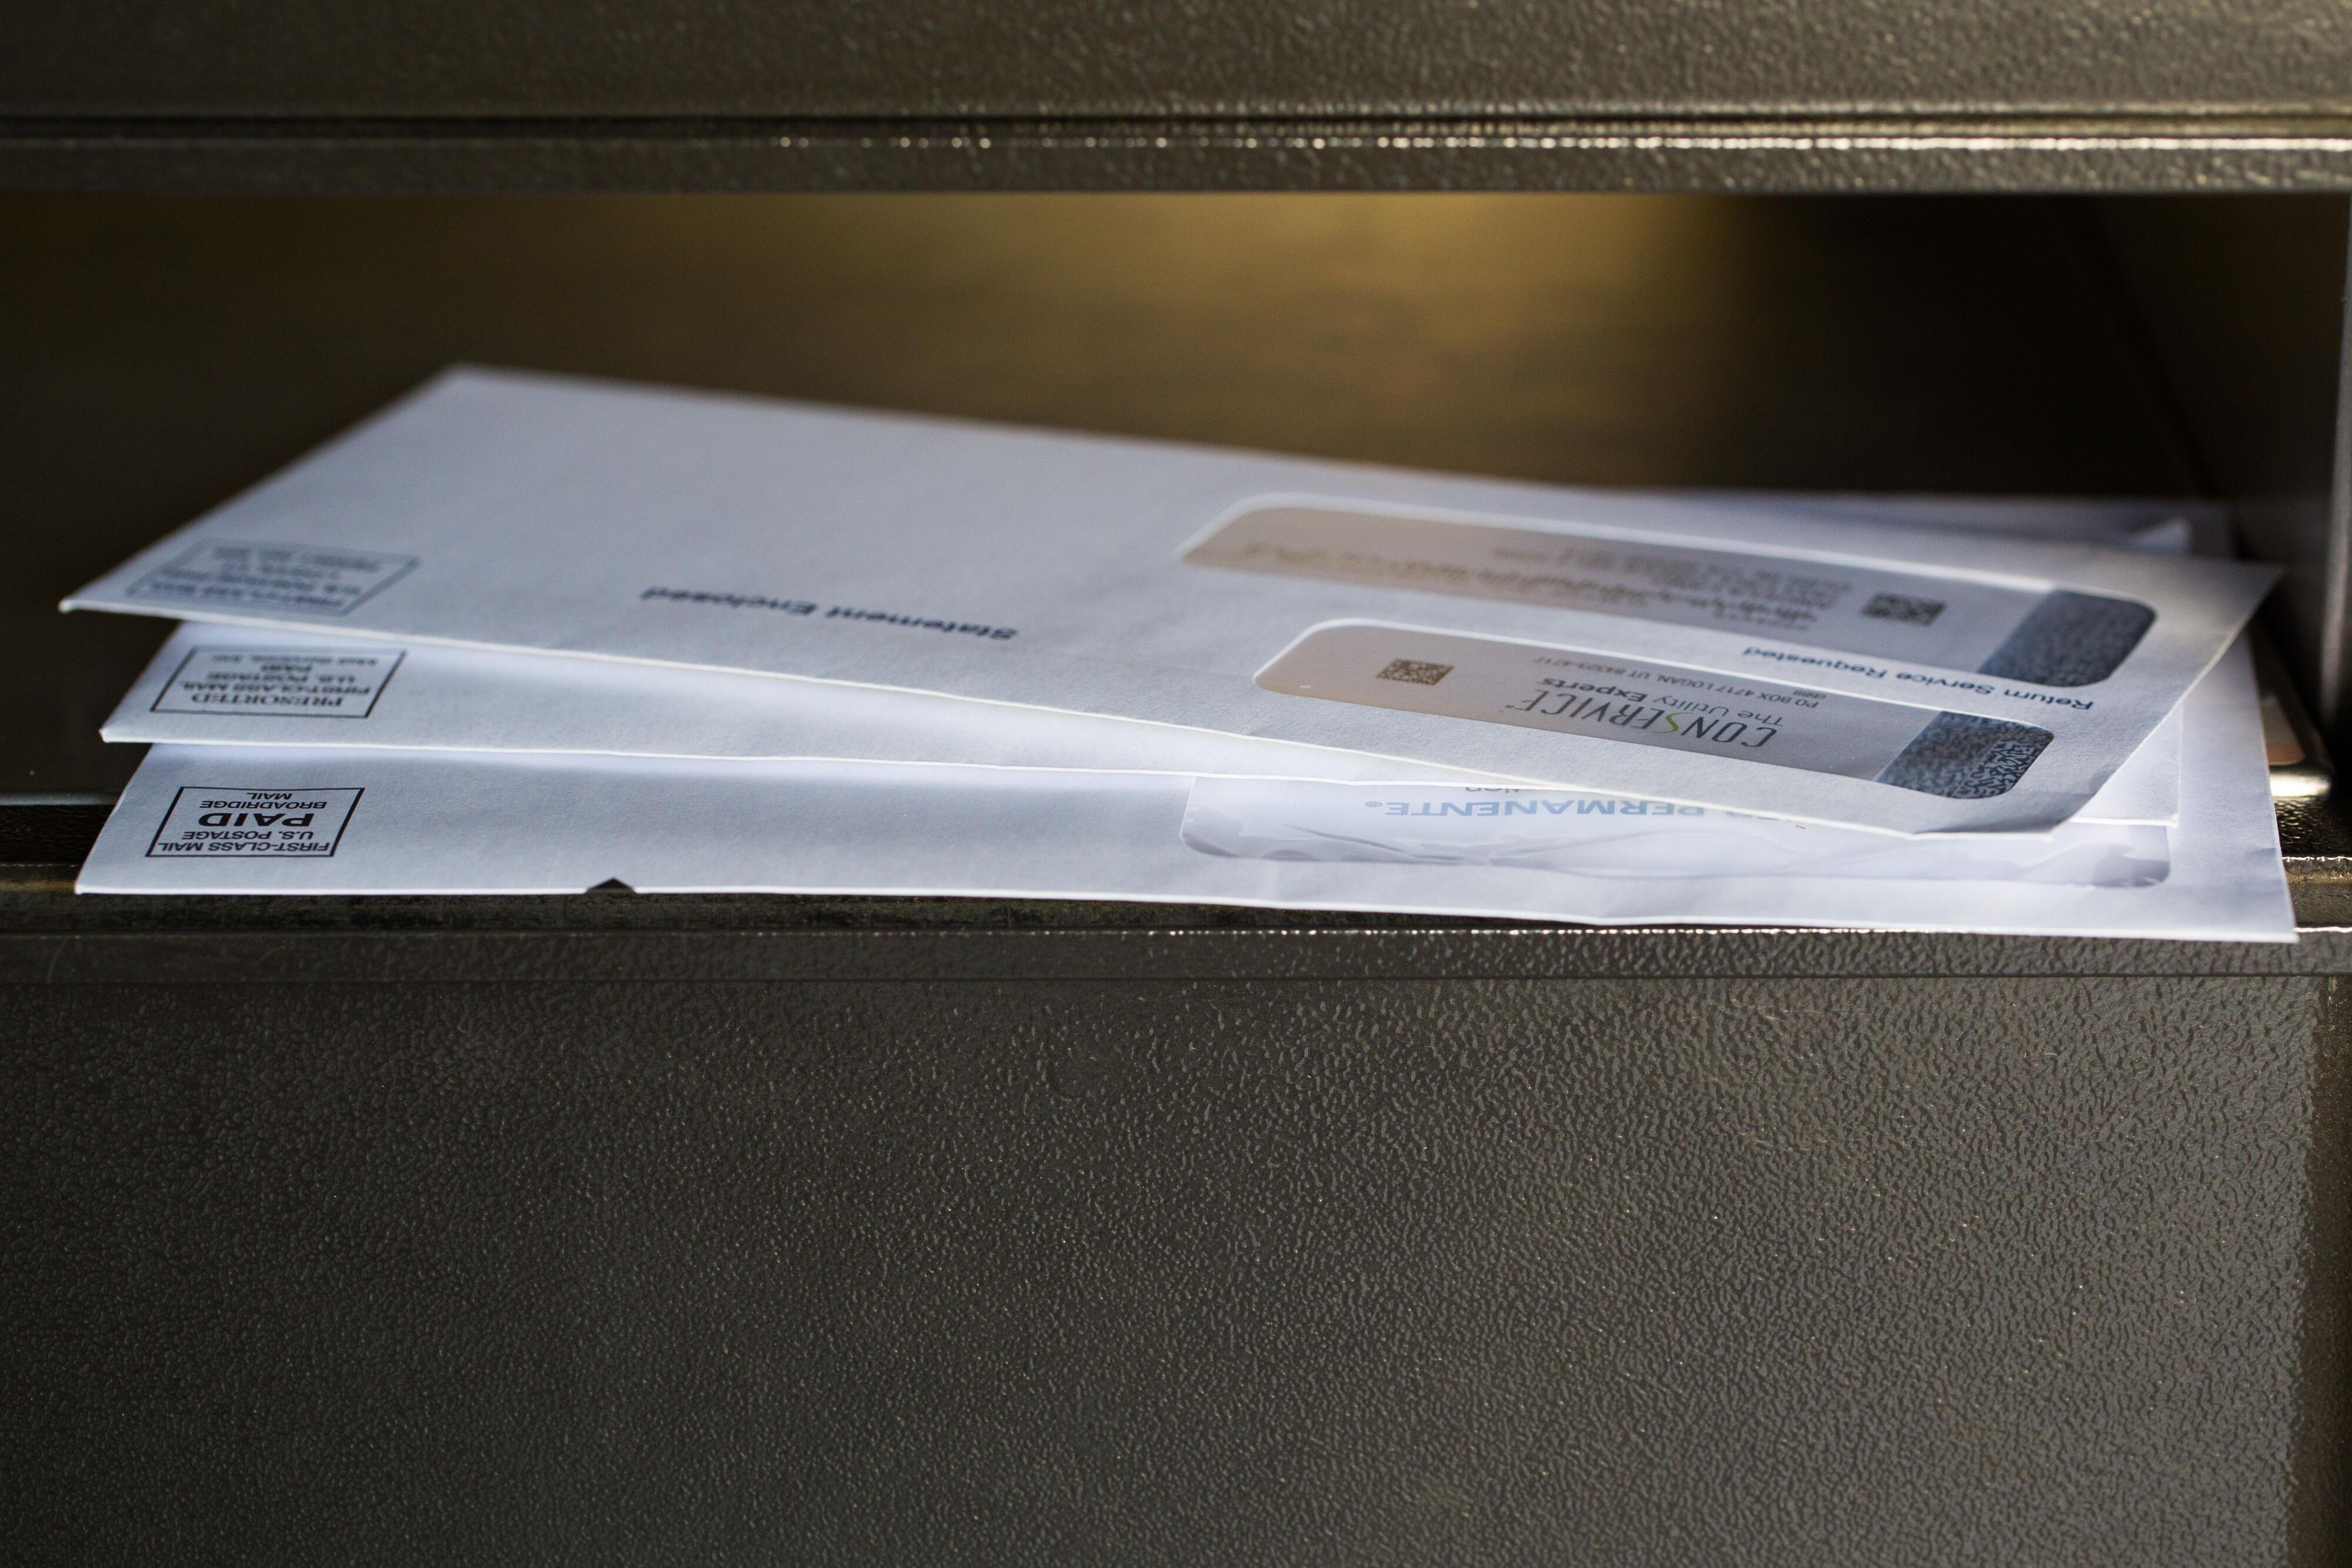 stimulus-mailboxes-coronaviris-2578